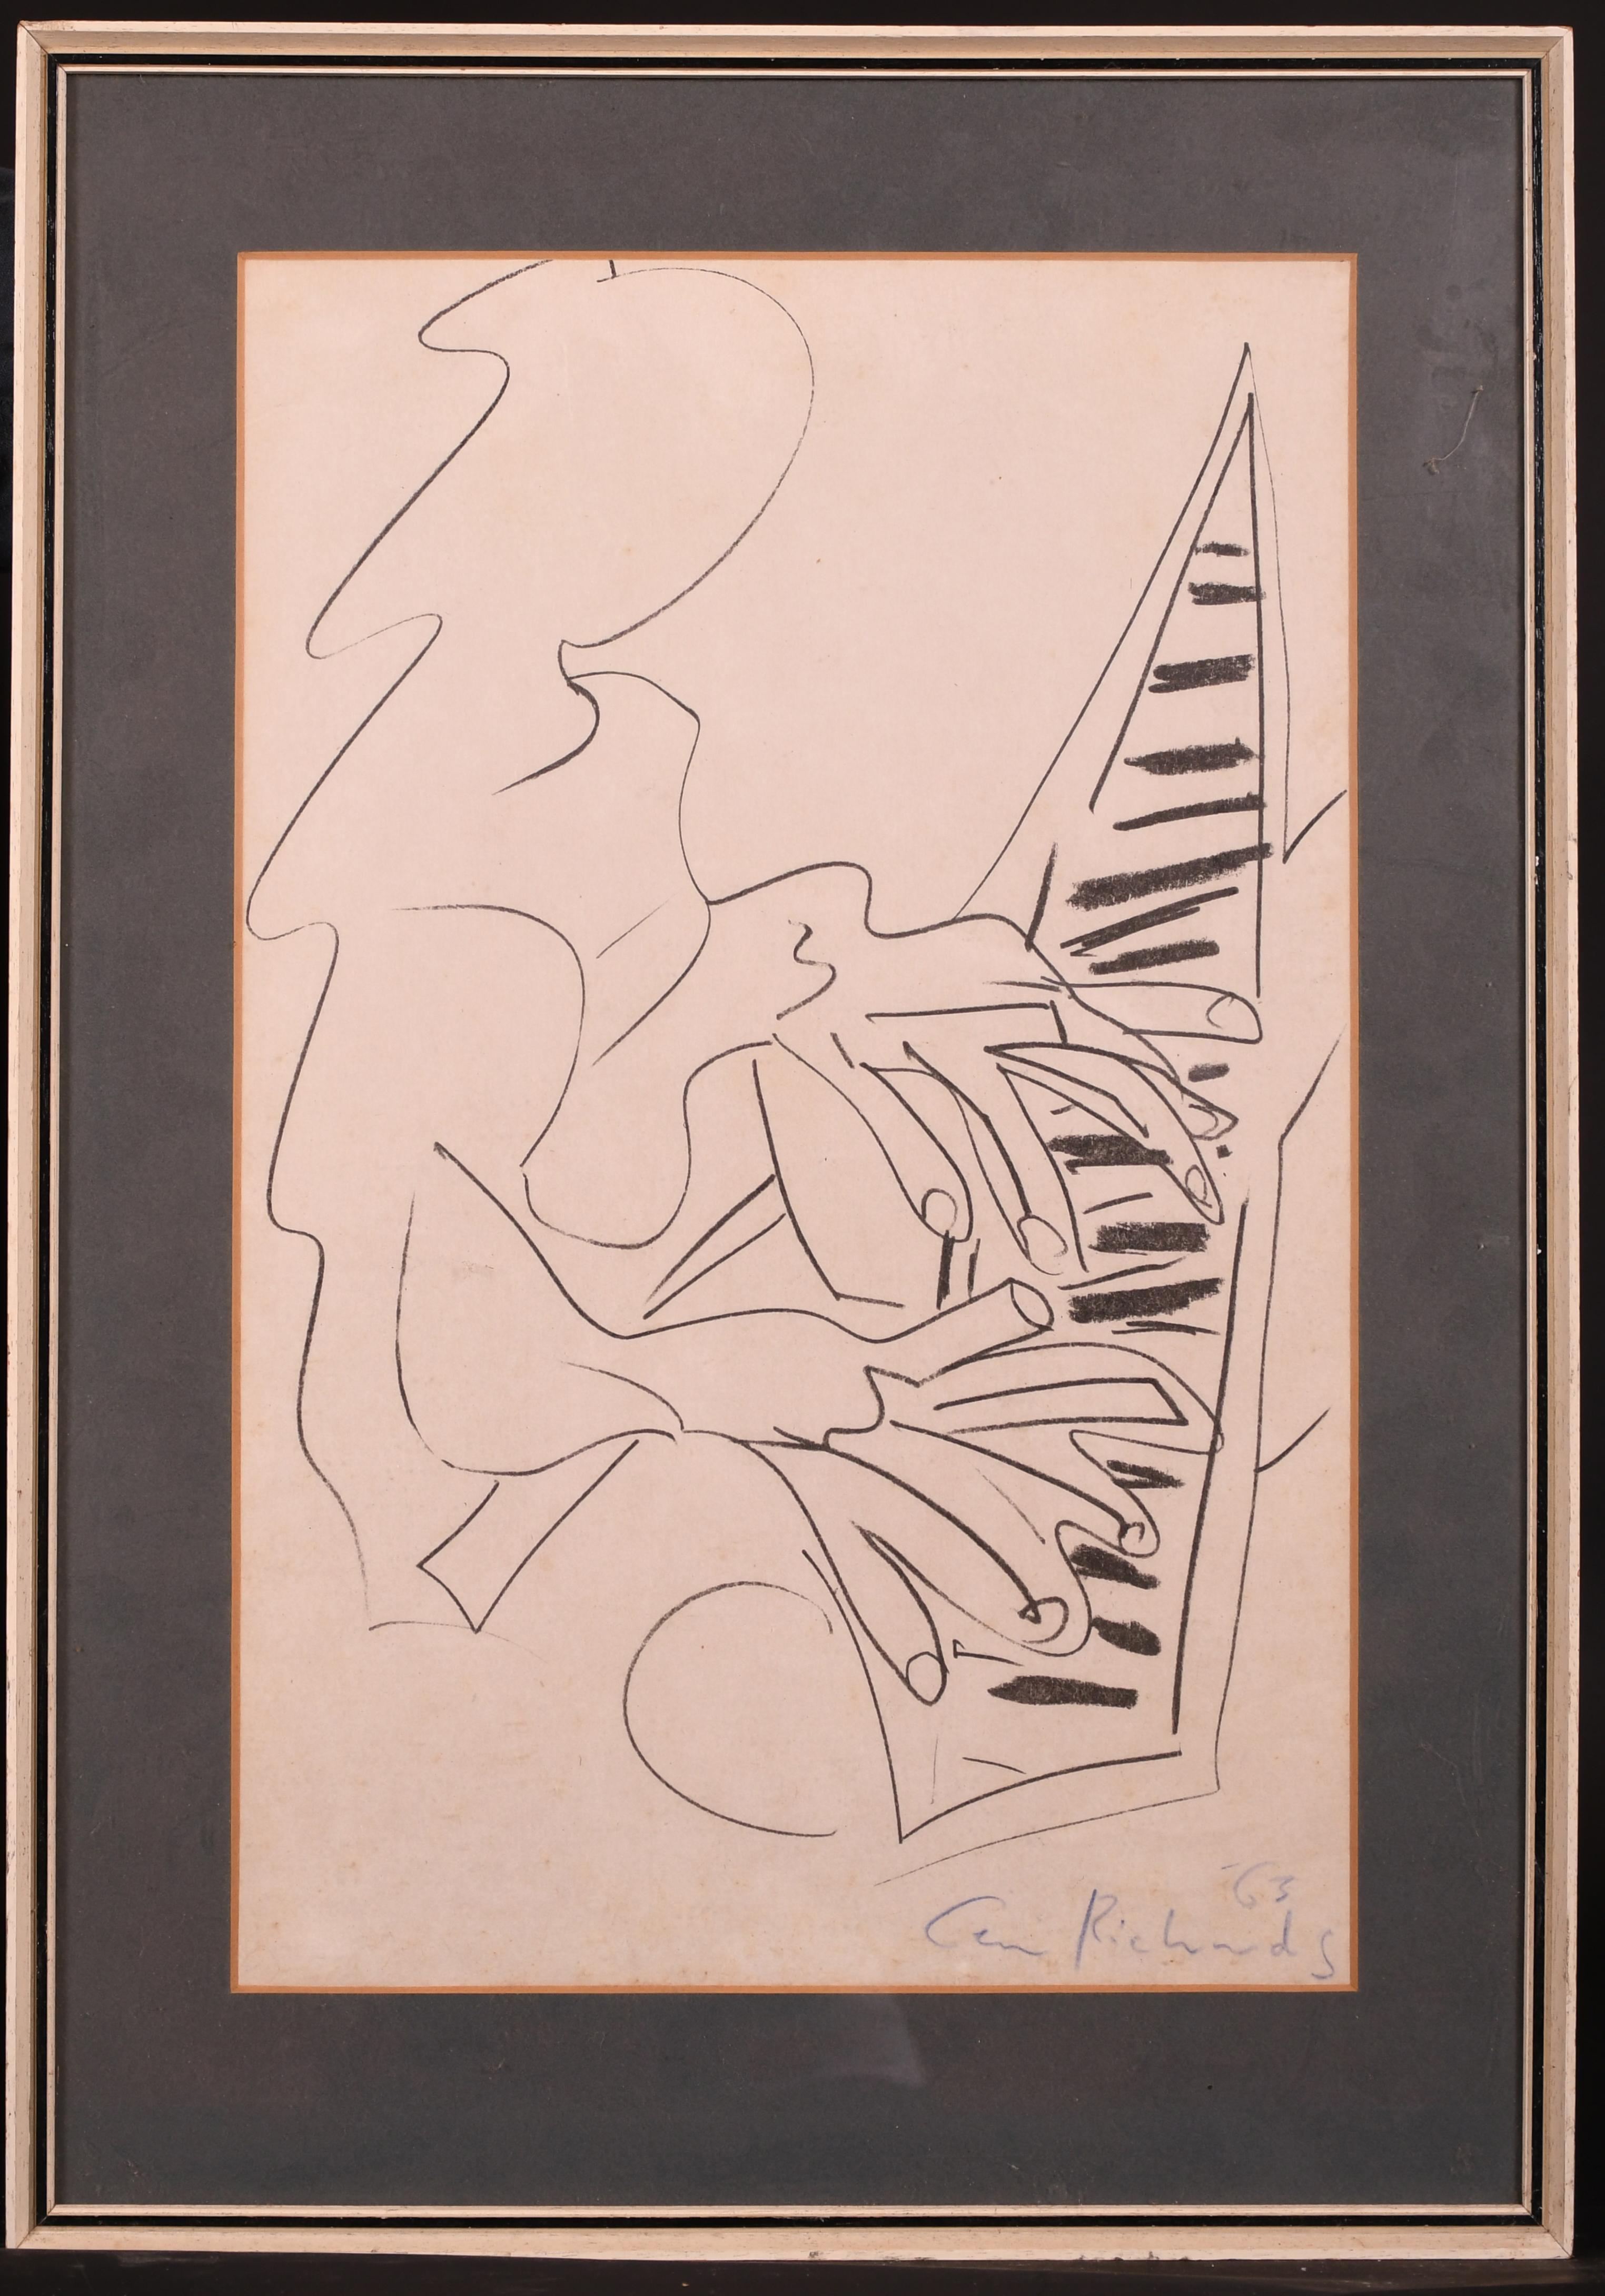 "Ceri Richards (1903-1971) British. ""The Pianist"", Lithograph, 19"" x 12.25"" (48.3 x 31cm) - Image 2 of 4"